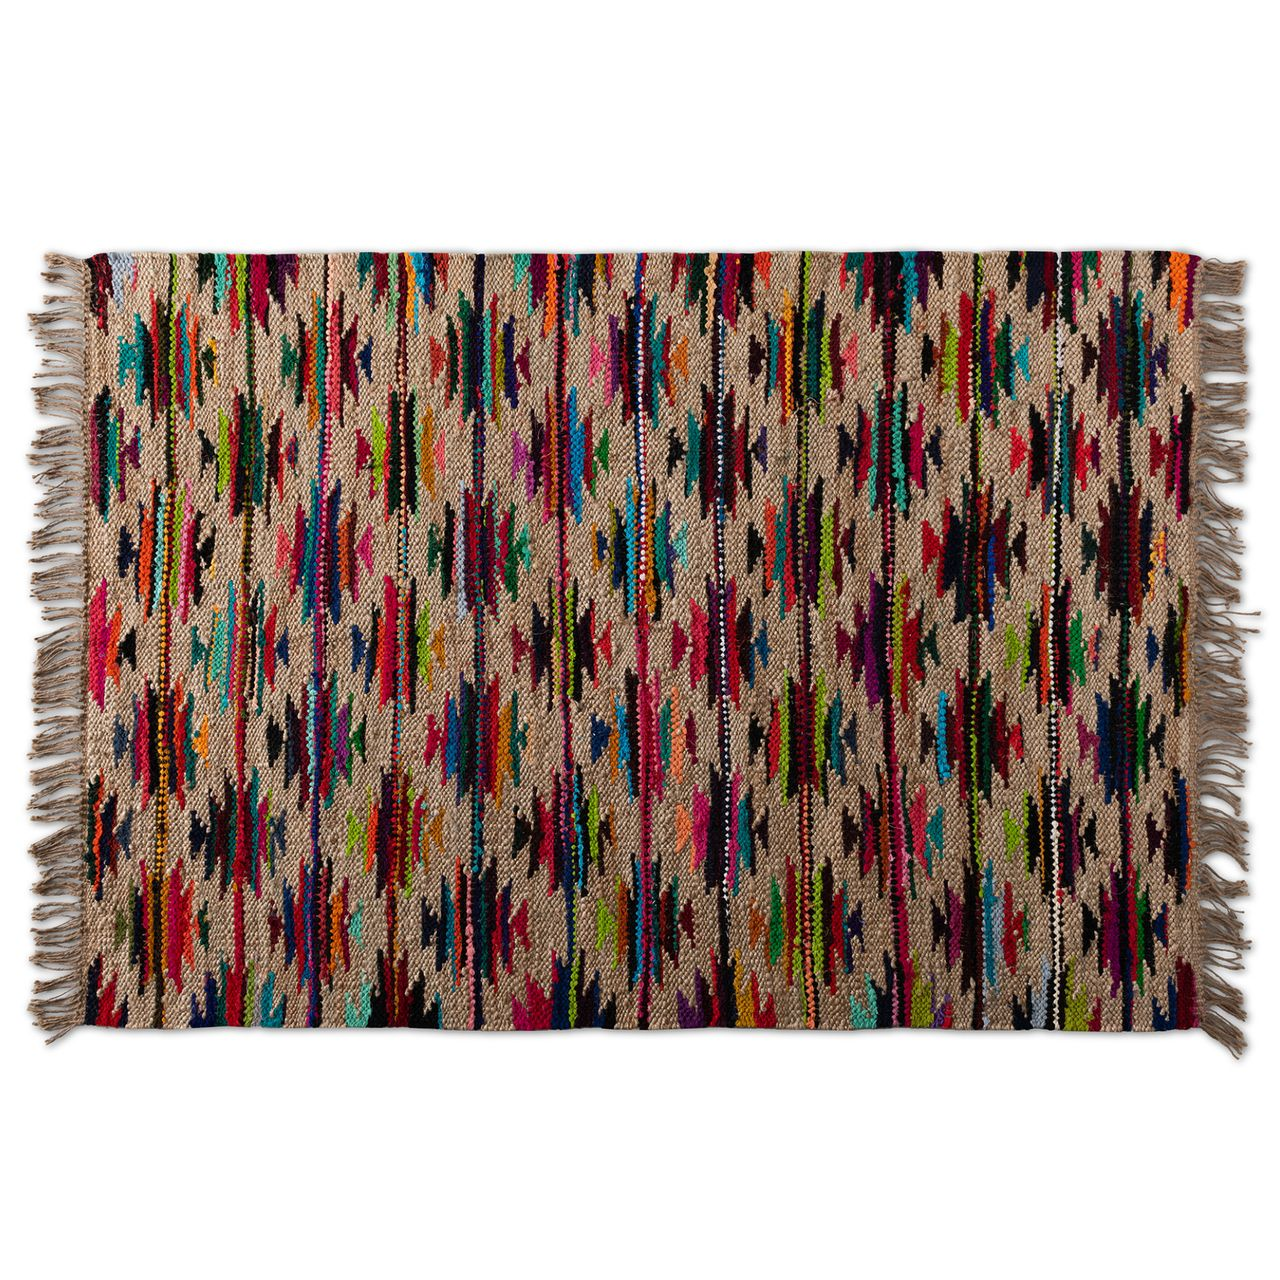 Baxton Studio Zurich Multi-Colored Handwoven Hemp Blend Area Rug